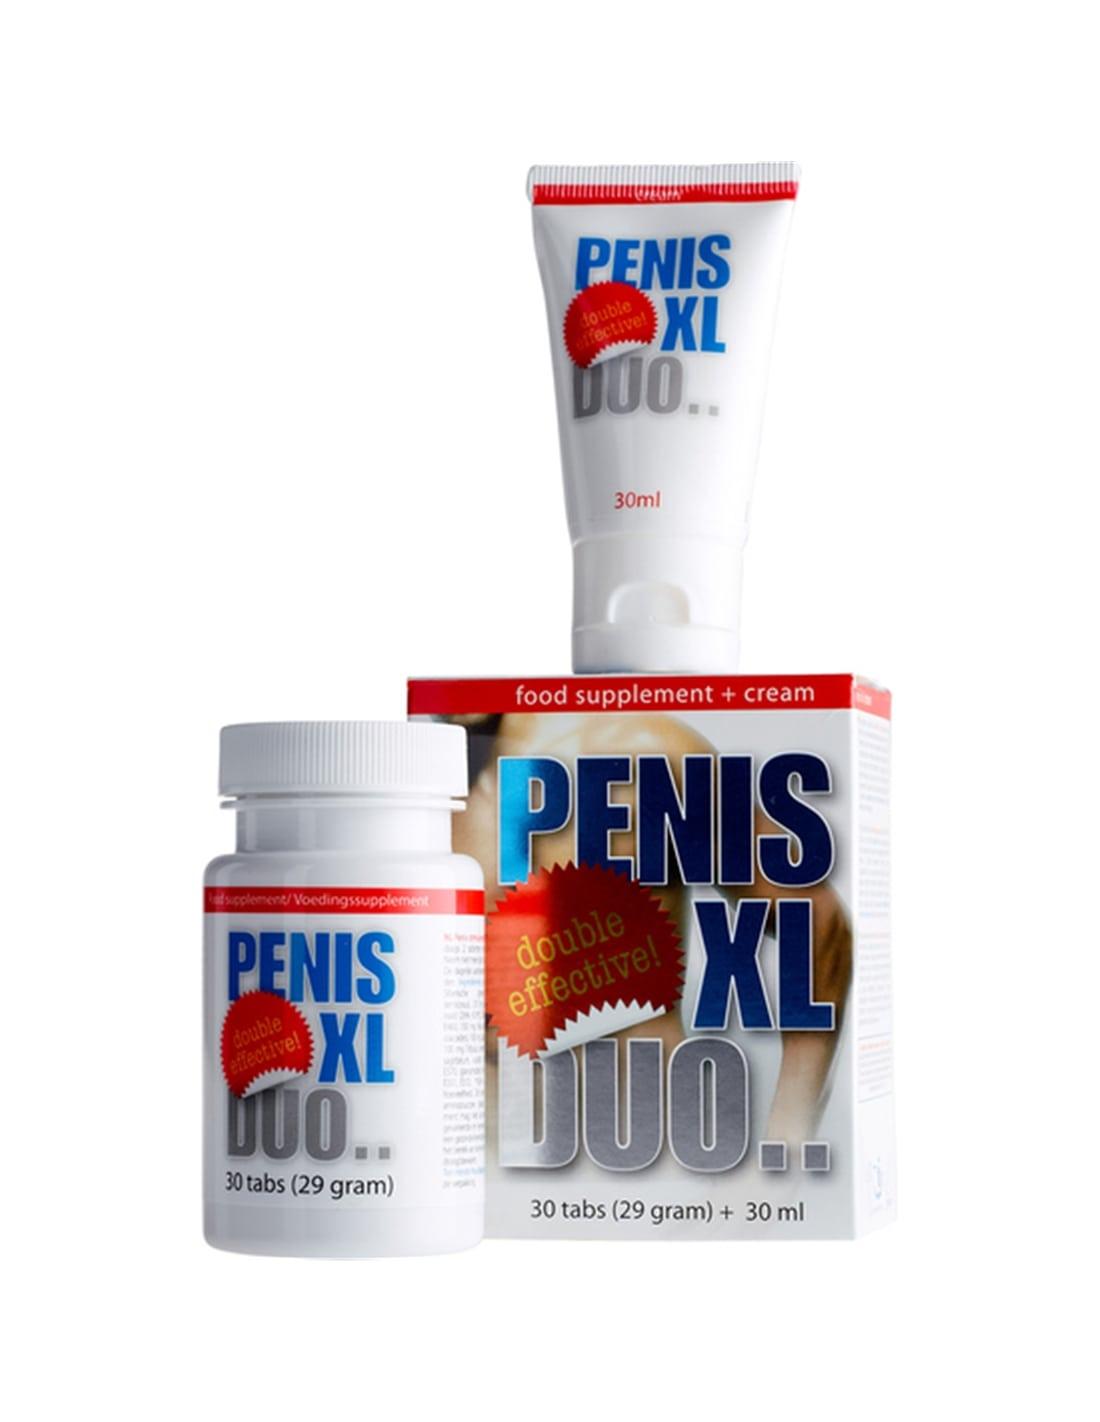 15069 - Penis Xl Duo-PR2010312102